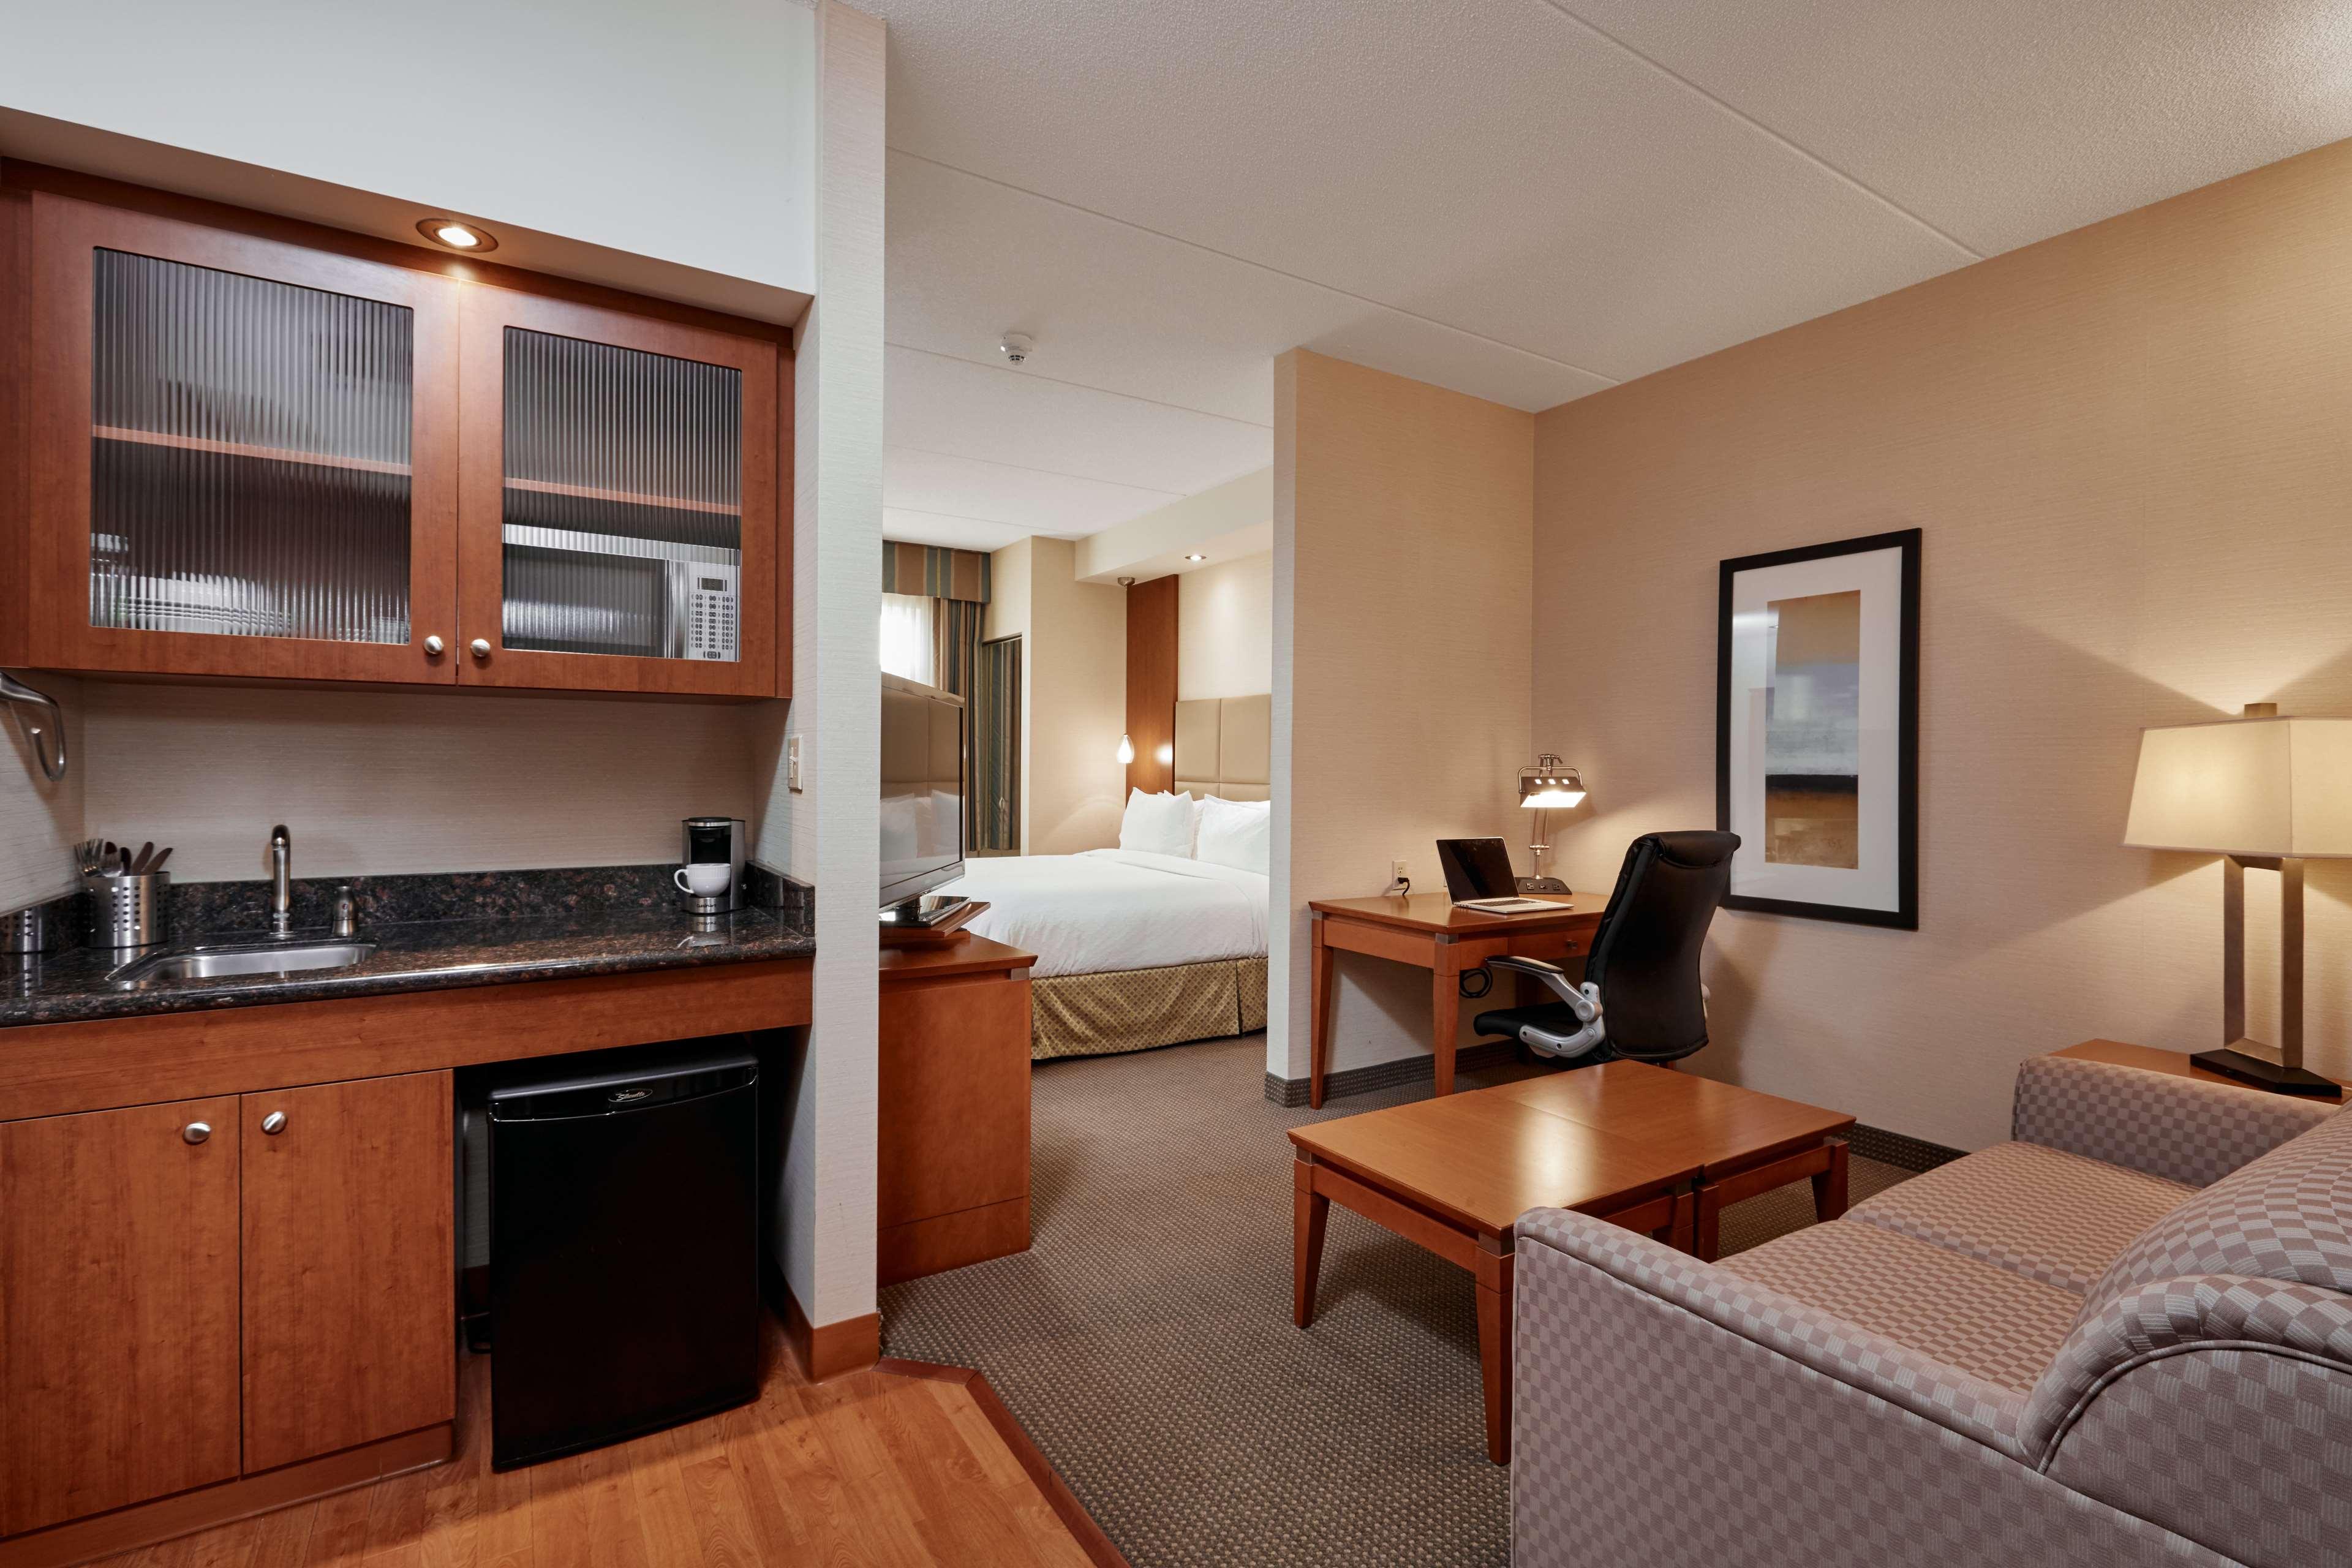 Guest Room Best Western Plus Orangeville Inn & Suites Orangeville (519)941-3311